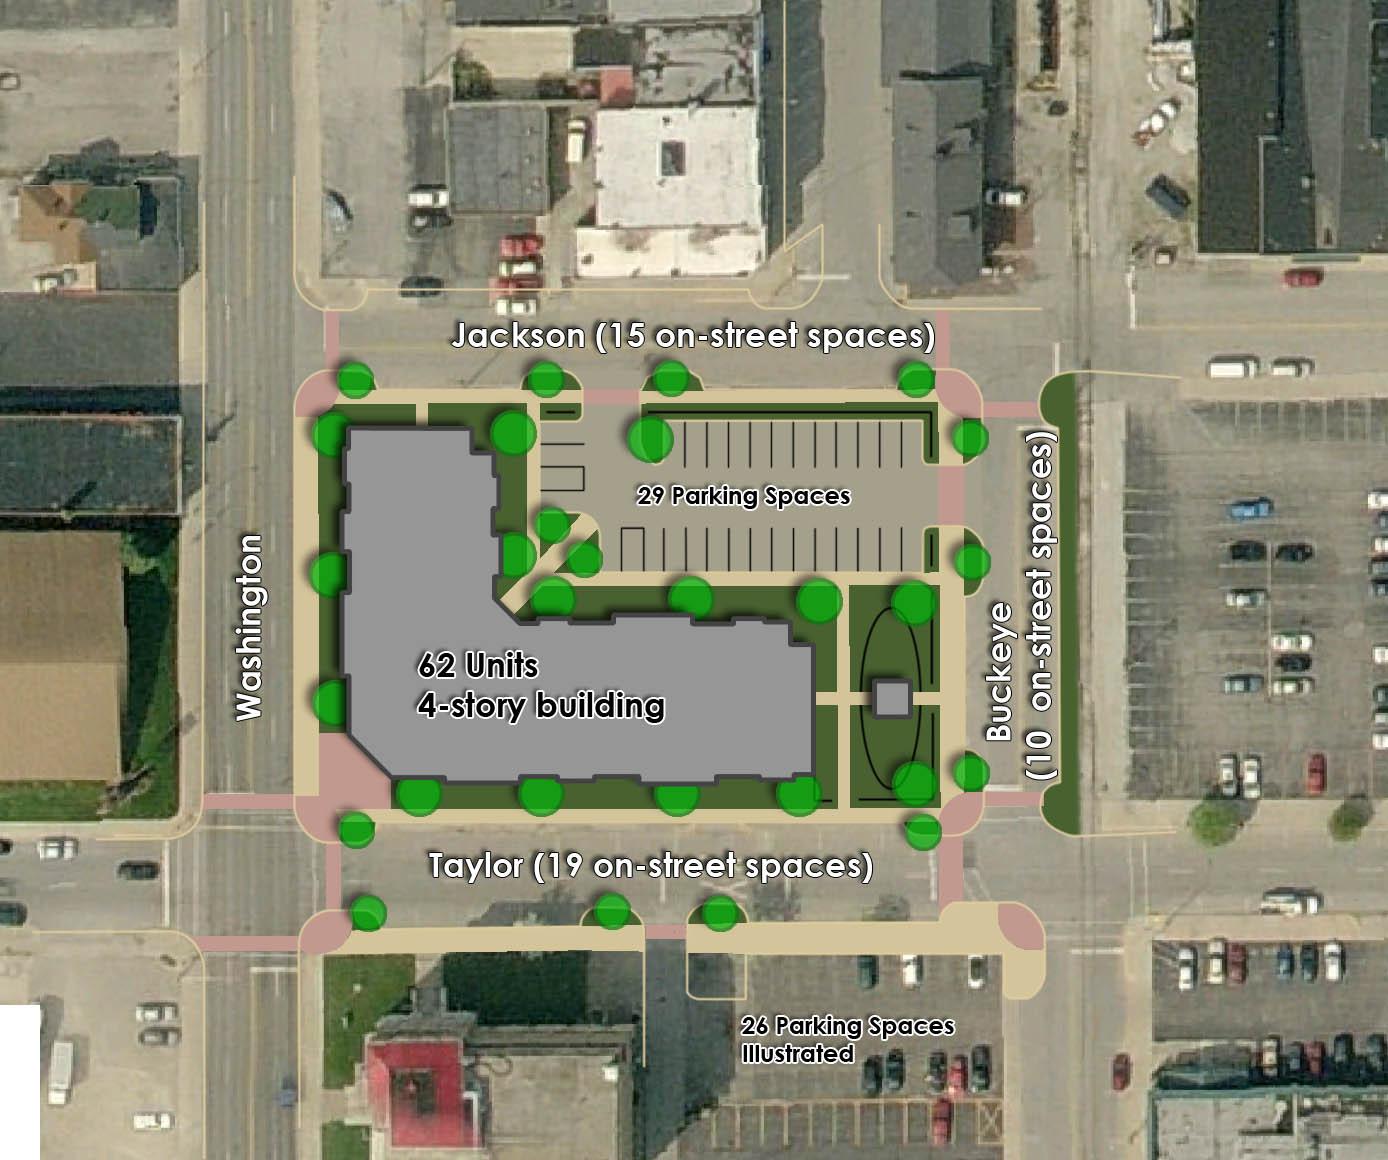 Senior Citizen Apartments: Senior Citizen Housing Development Coming To Downtown